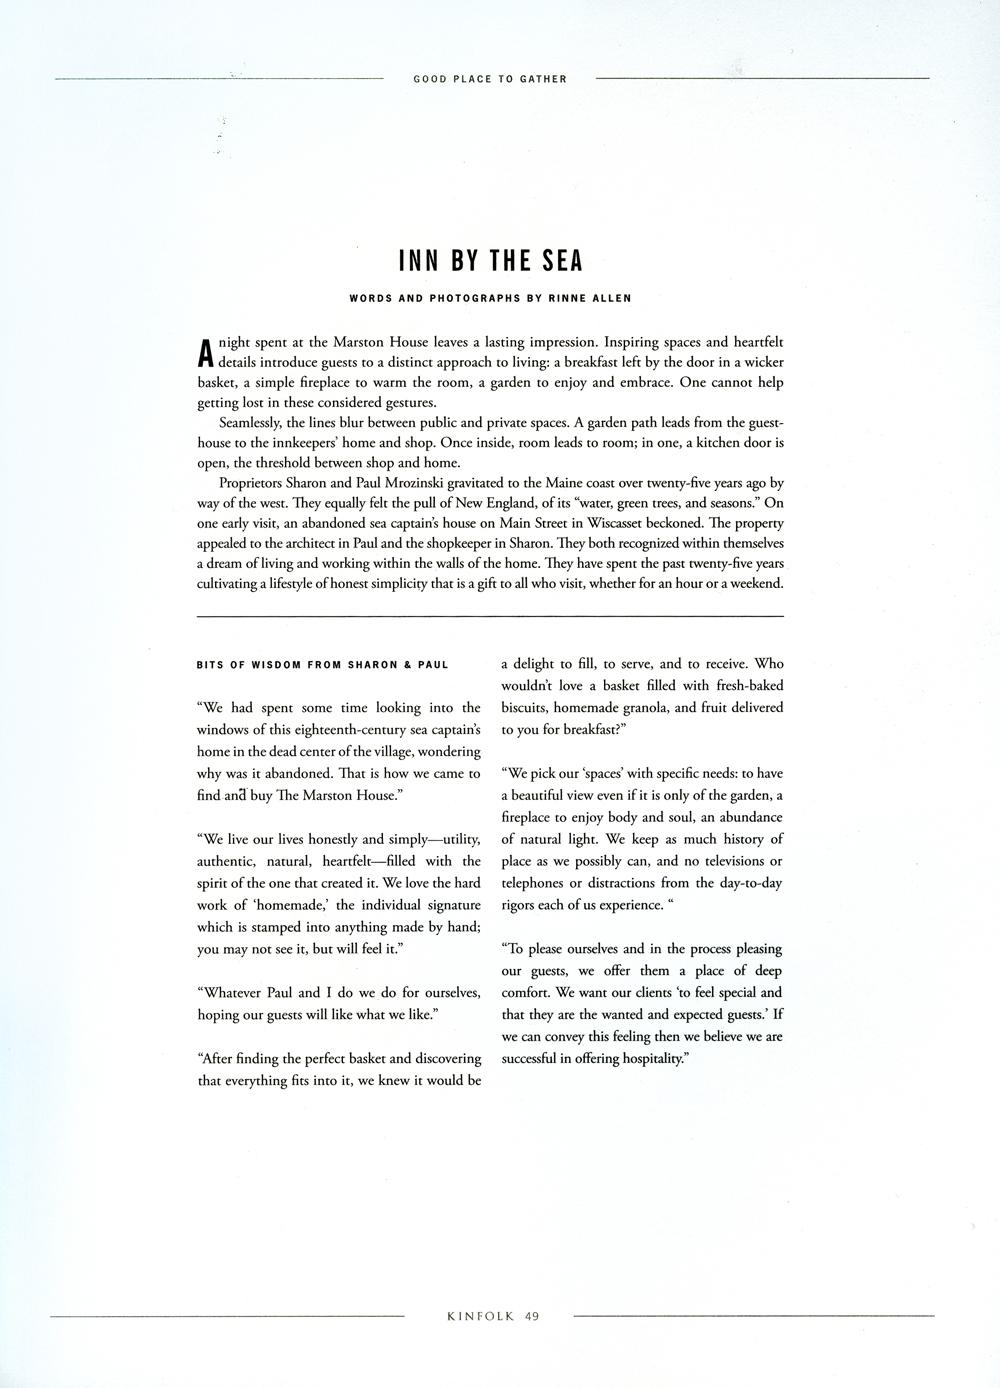 kinfolk, volume 4 - scan 3.jpg